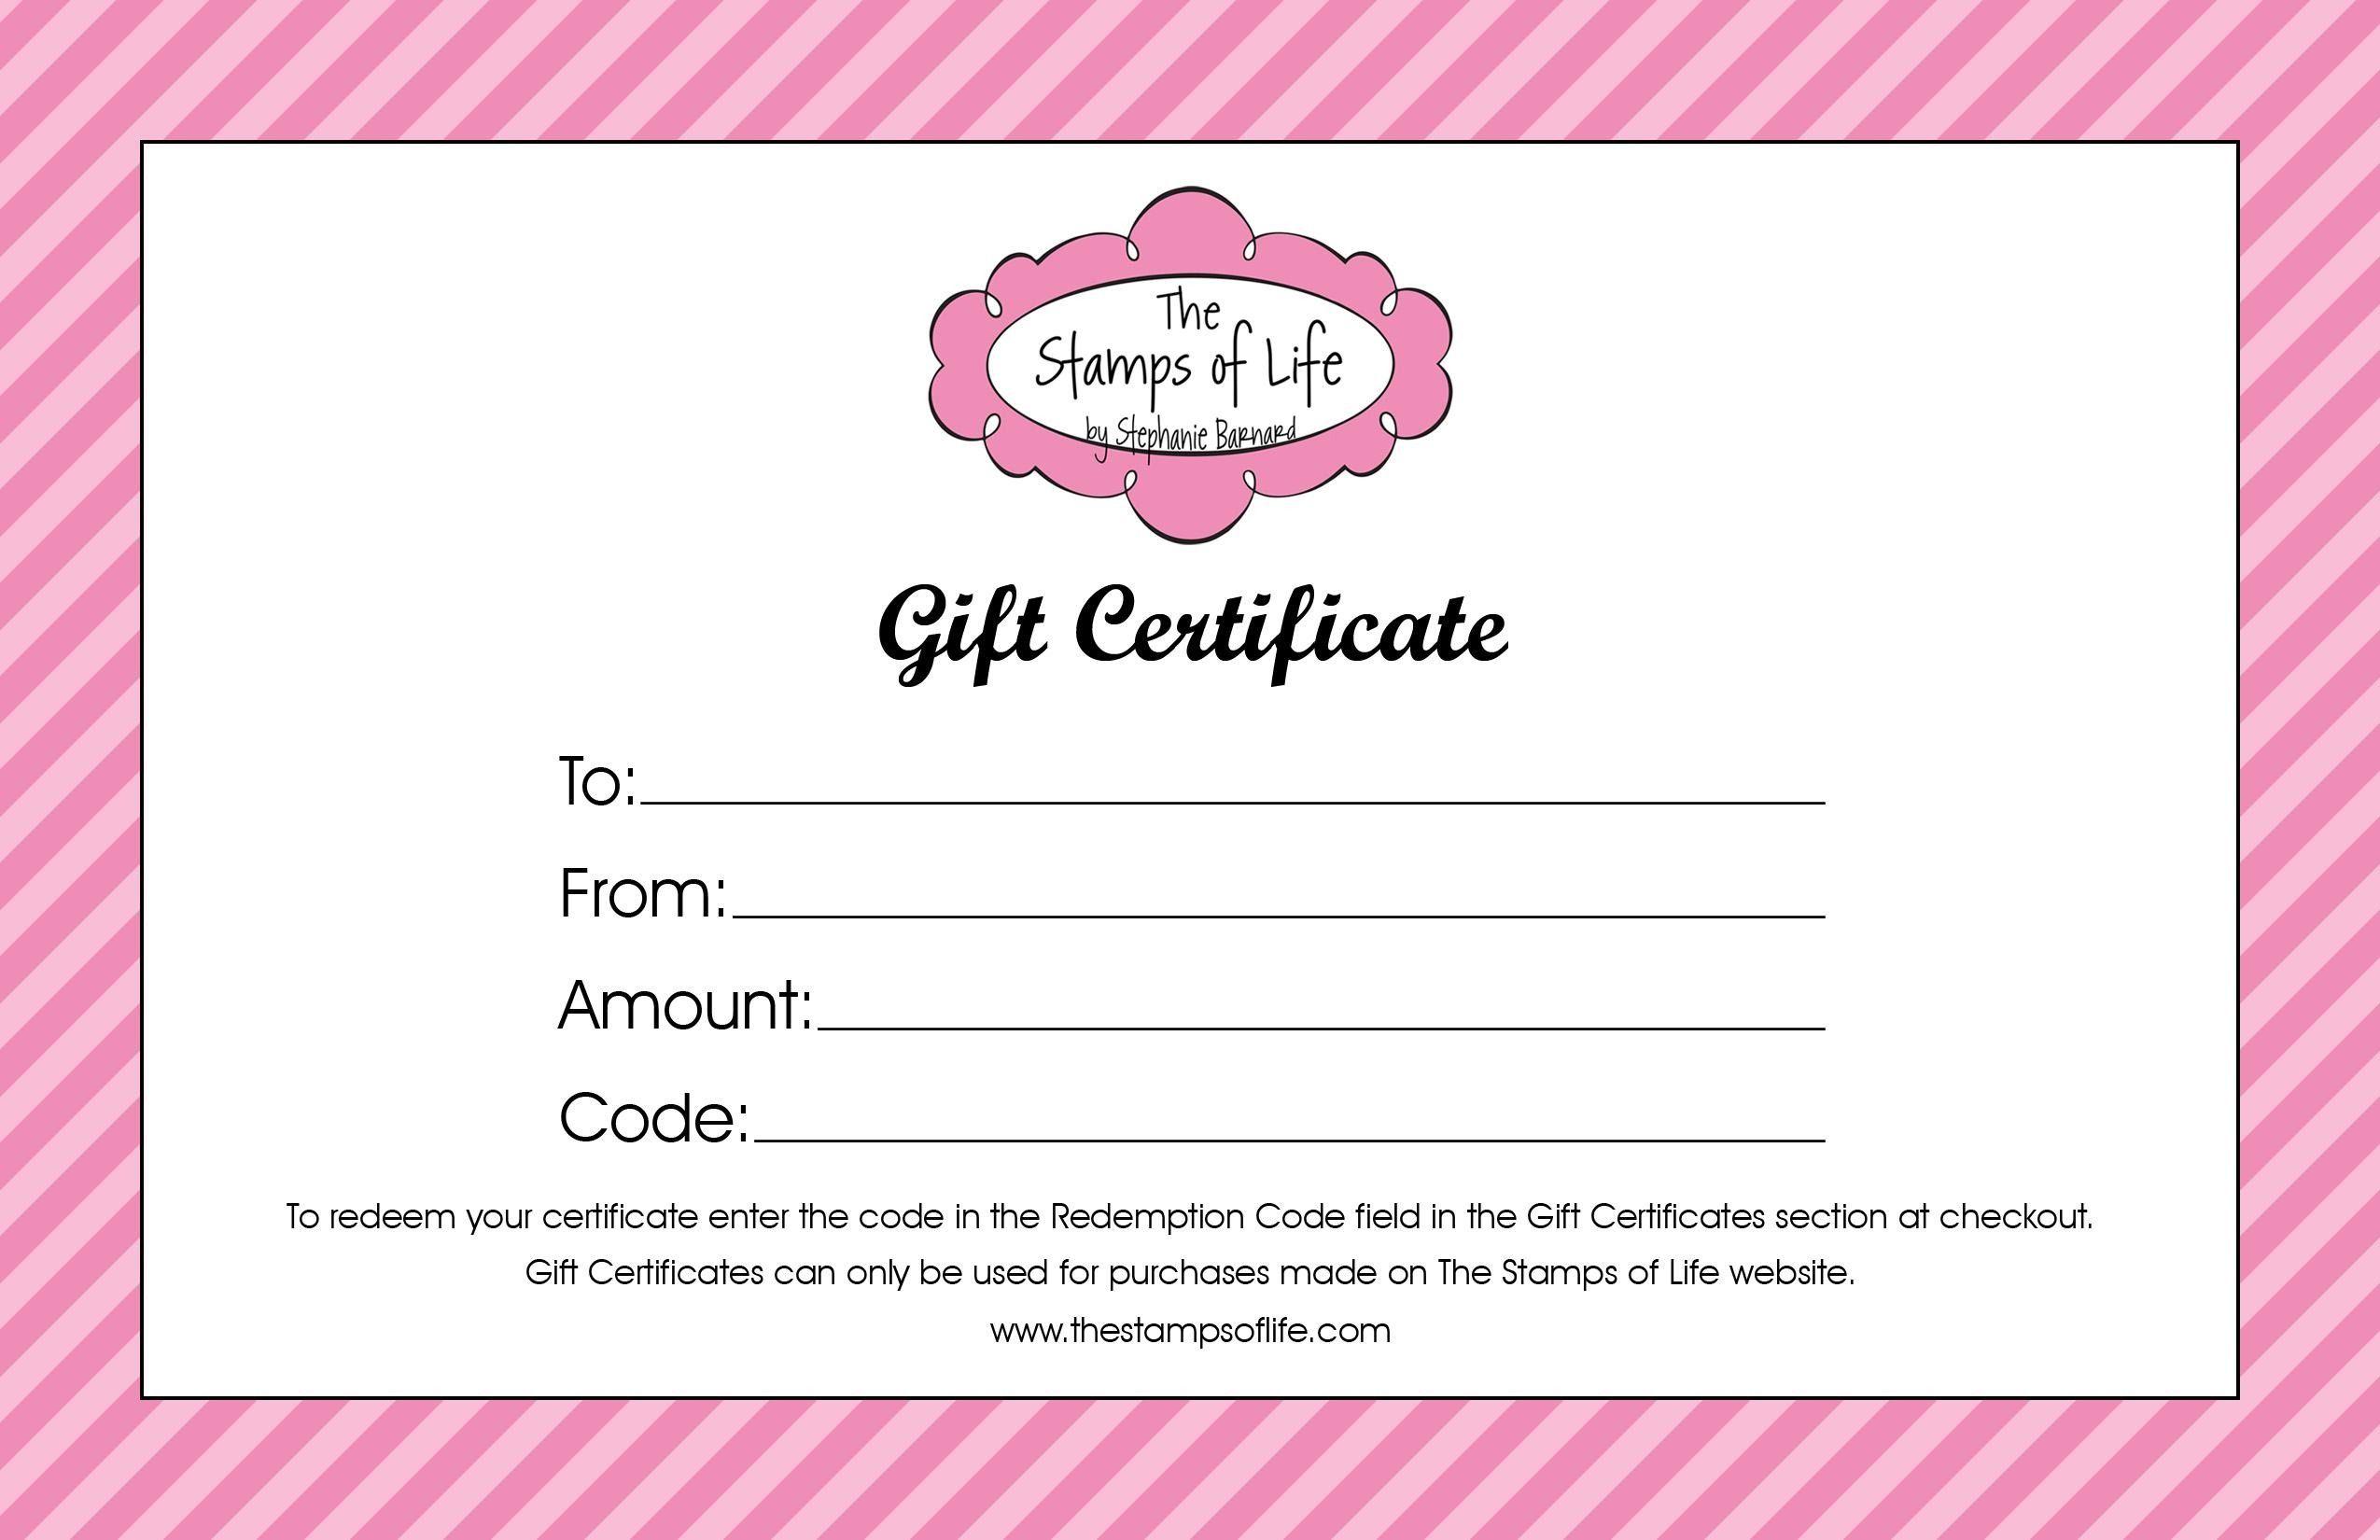 Salon Gift Certificate Template Free Printable Dealssiteco Simple - Free Printable Gift Certificates For Hair Salon